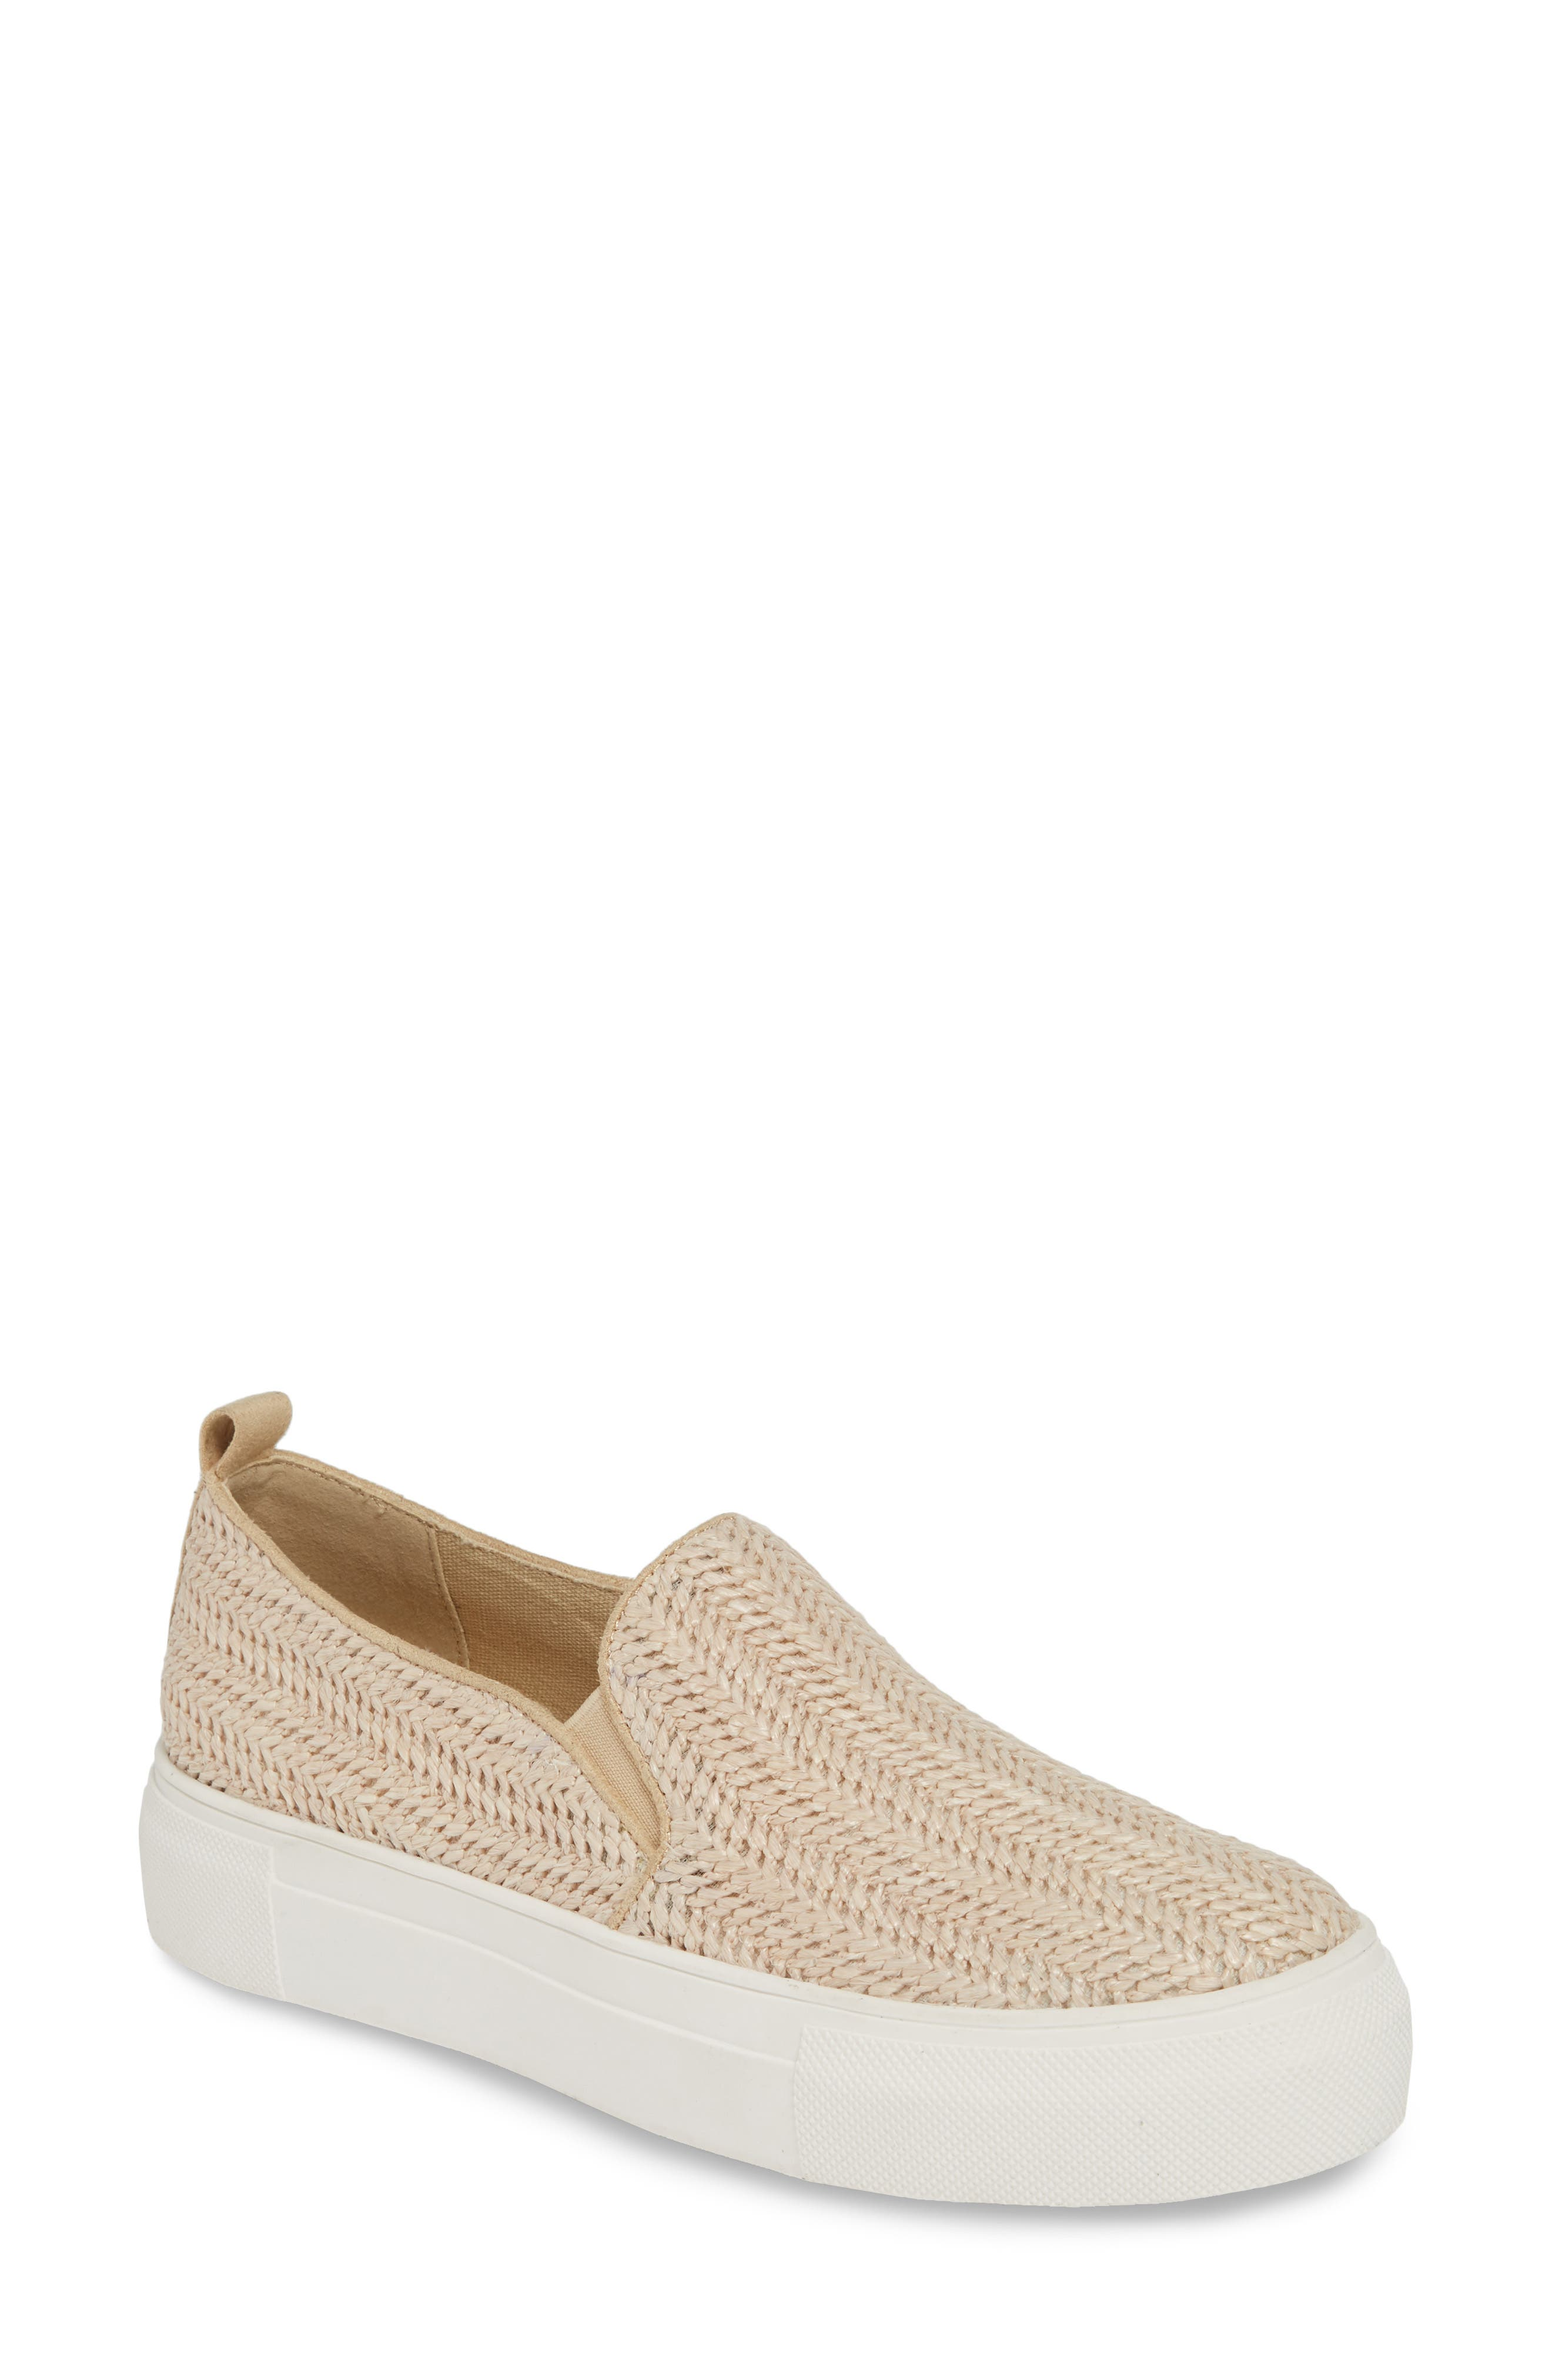 Mia Ela Woven Platform Sneaker, Beige